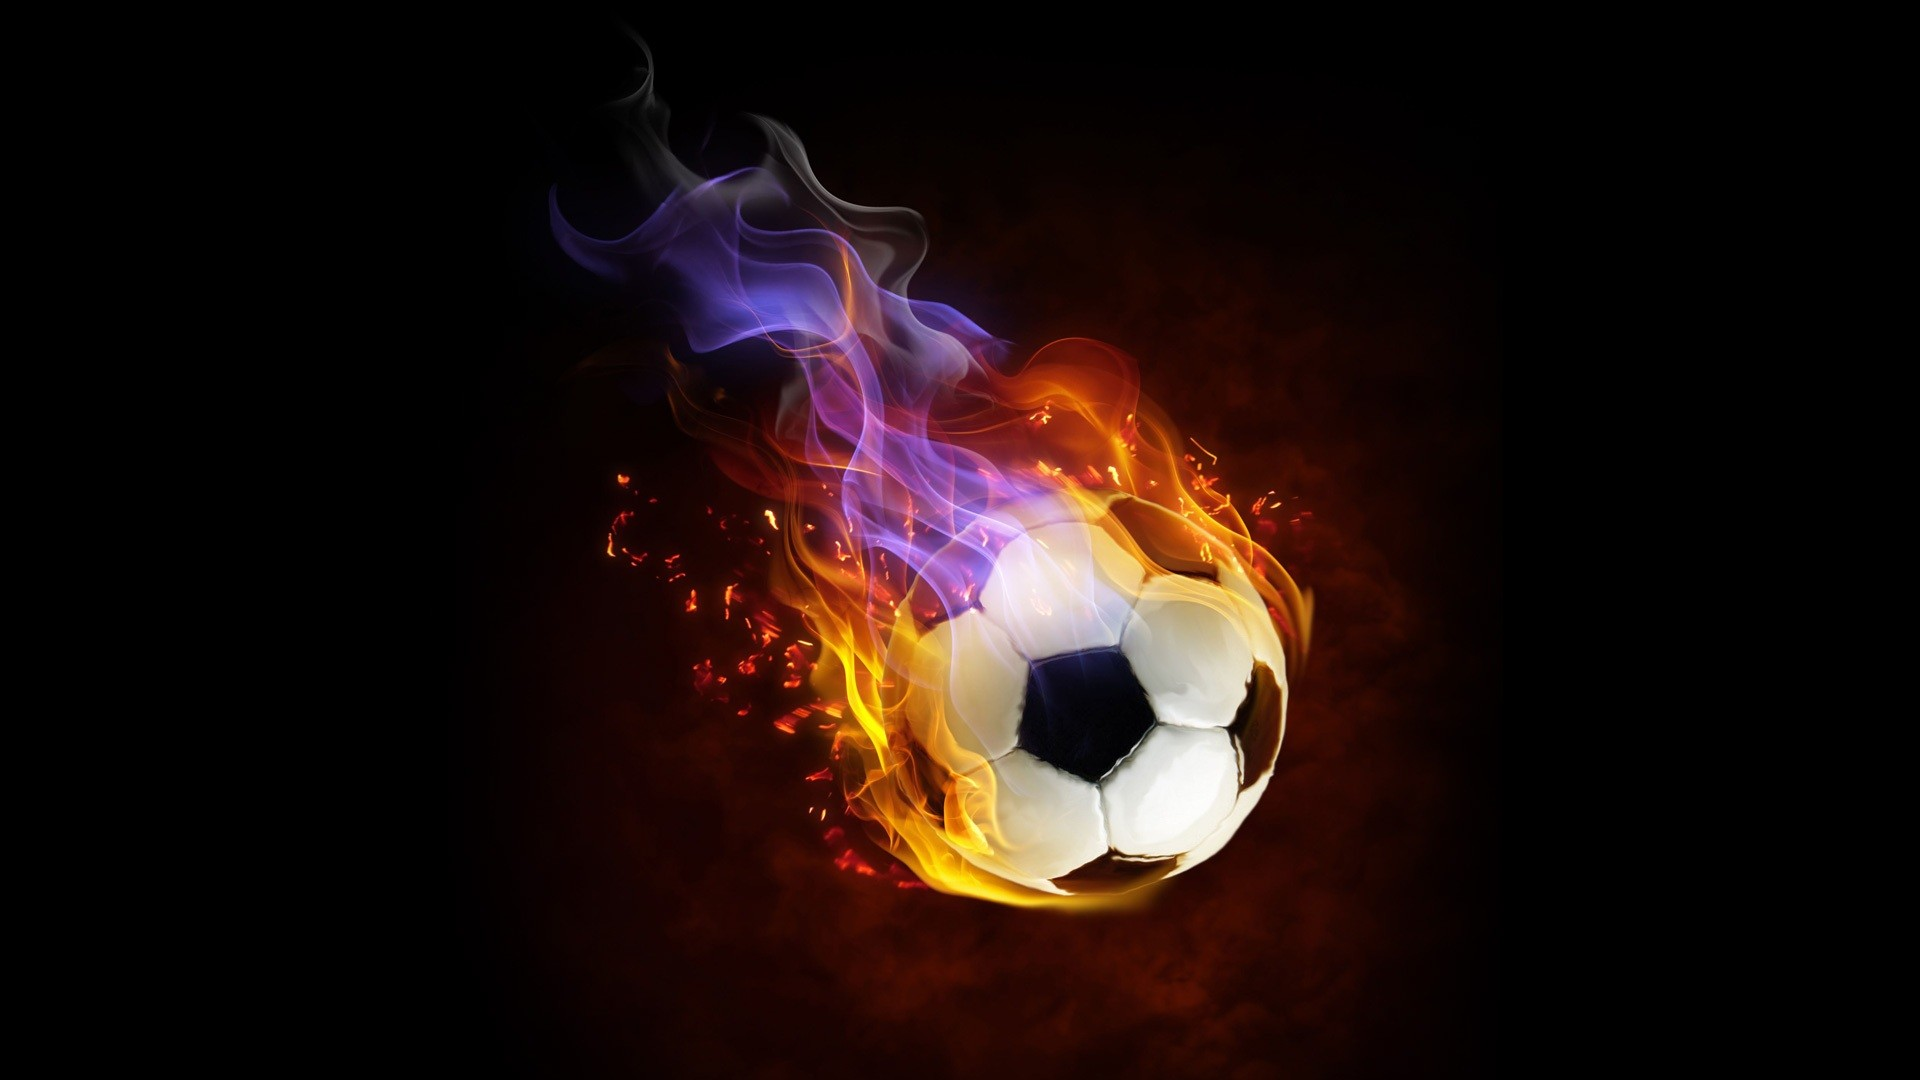 Cool Flaming Soccer Ball Wallpaper Soccer/football